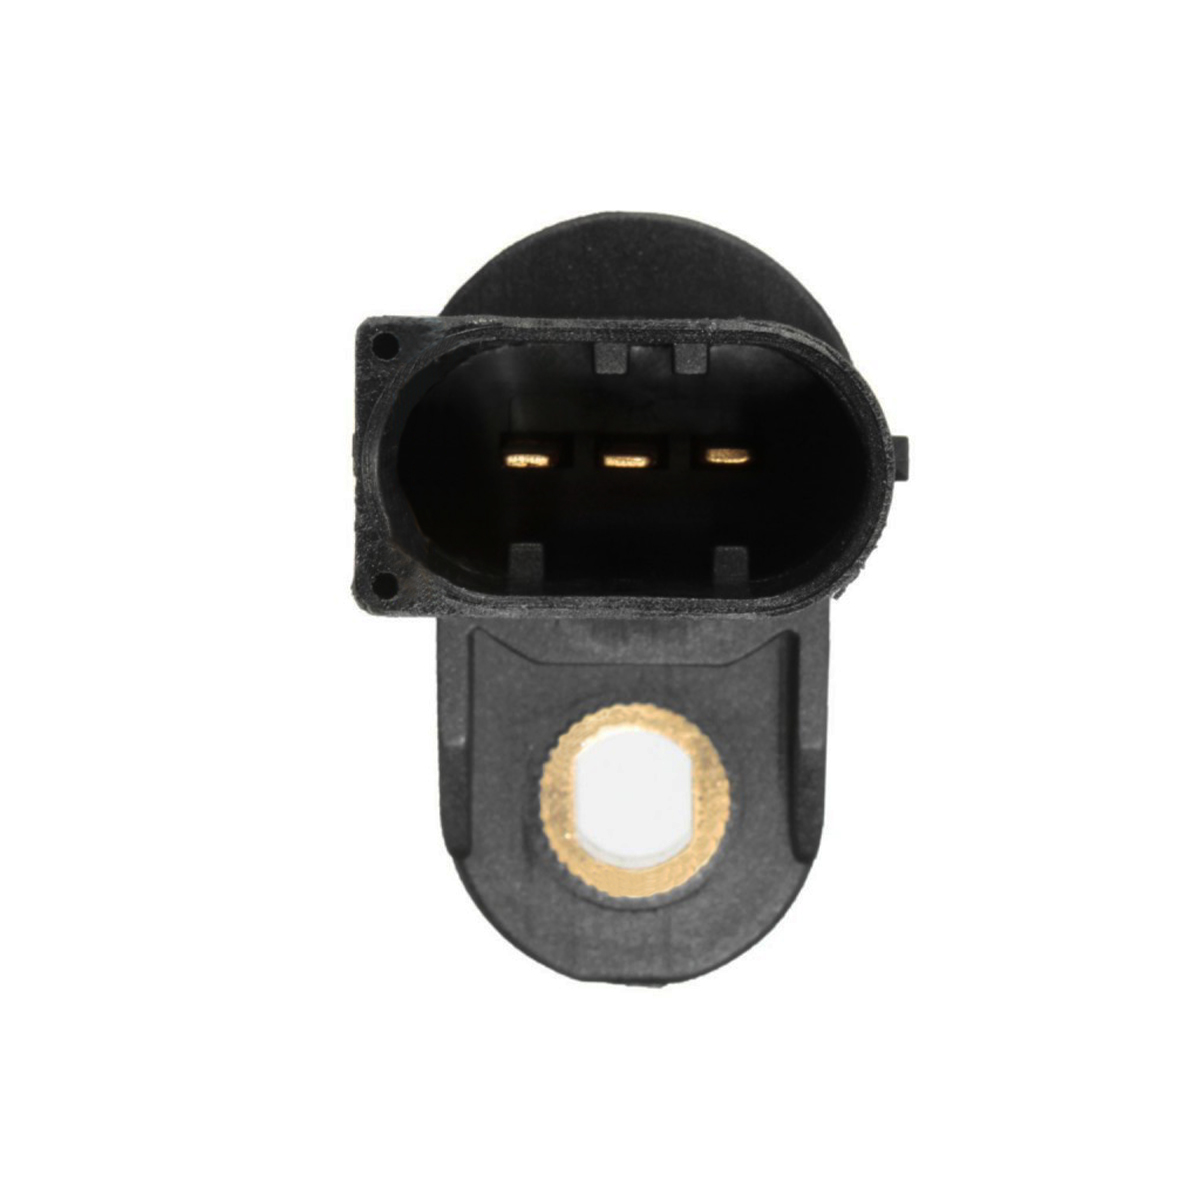 Sensor De Comando Fase Bmw E46 / E39 / E53 / E60 / E85 / 323